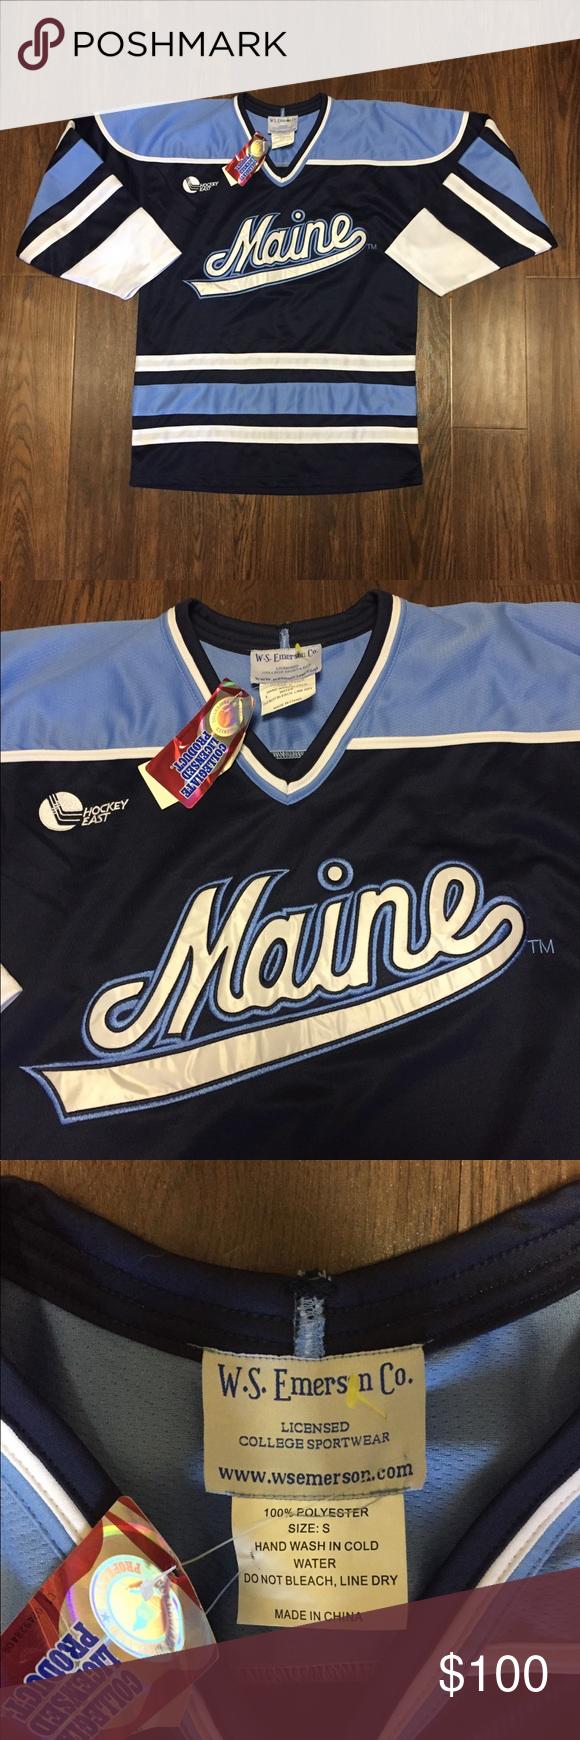 University of Maine Black Bears Hockey Jersey Brand W.S